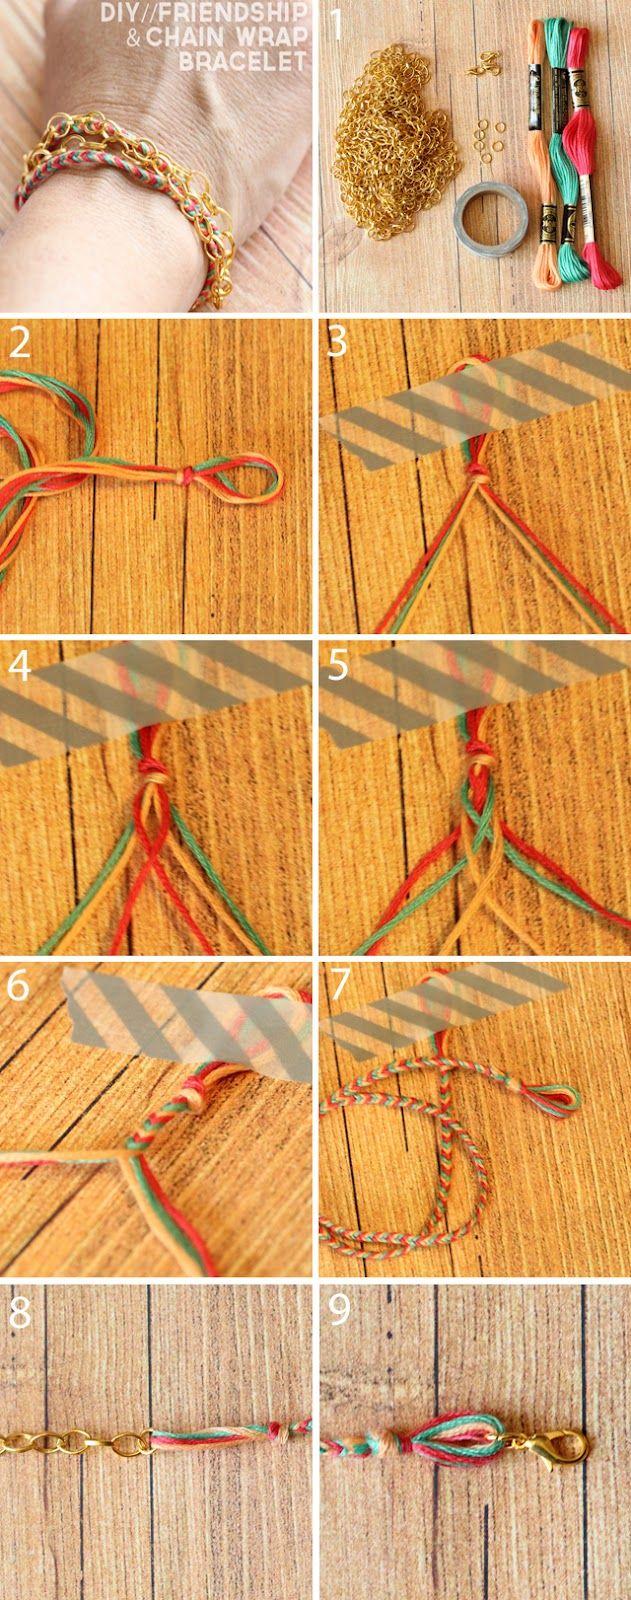 diy Bracelet Stacks | DIY :: Friendship & Chain Wrap Bracelet | ScrappyHappiness // Blog